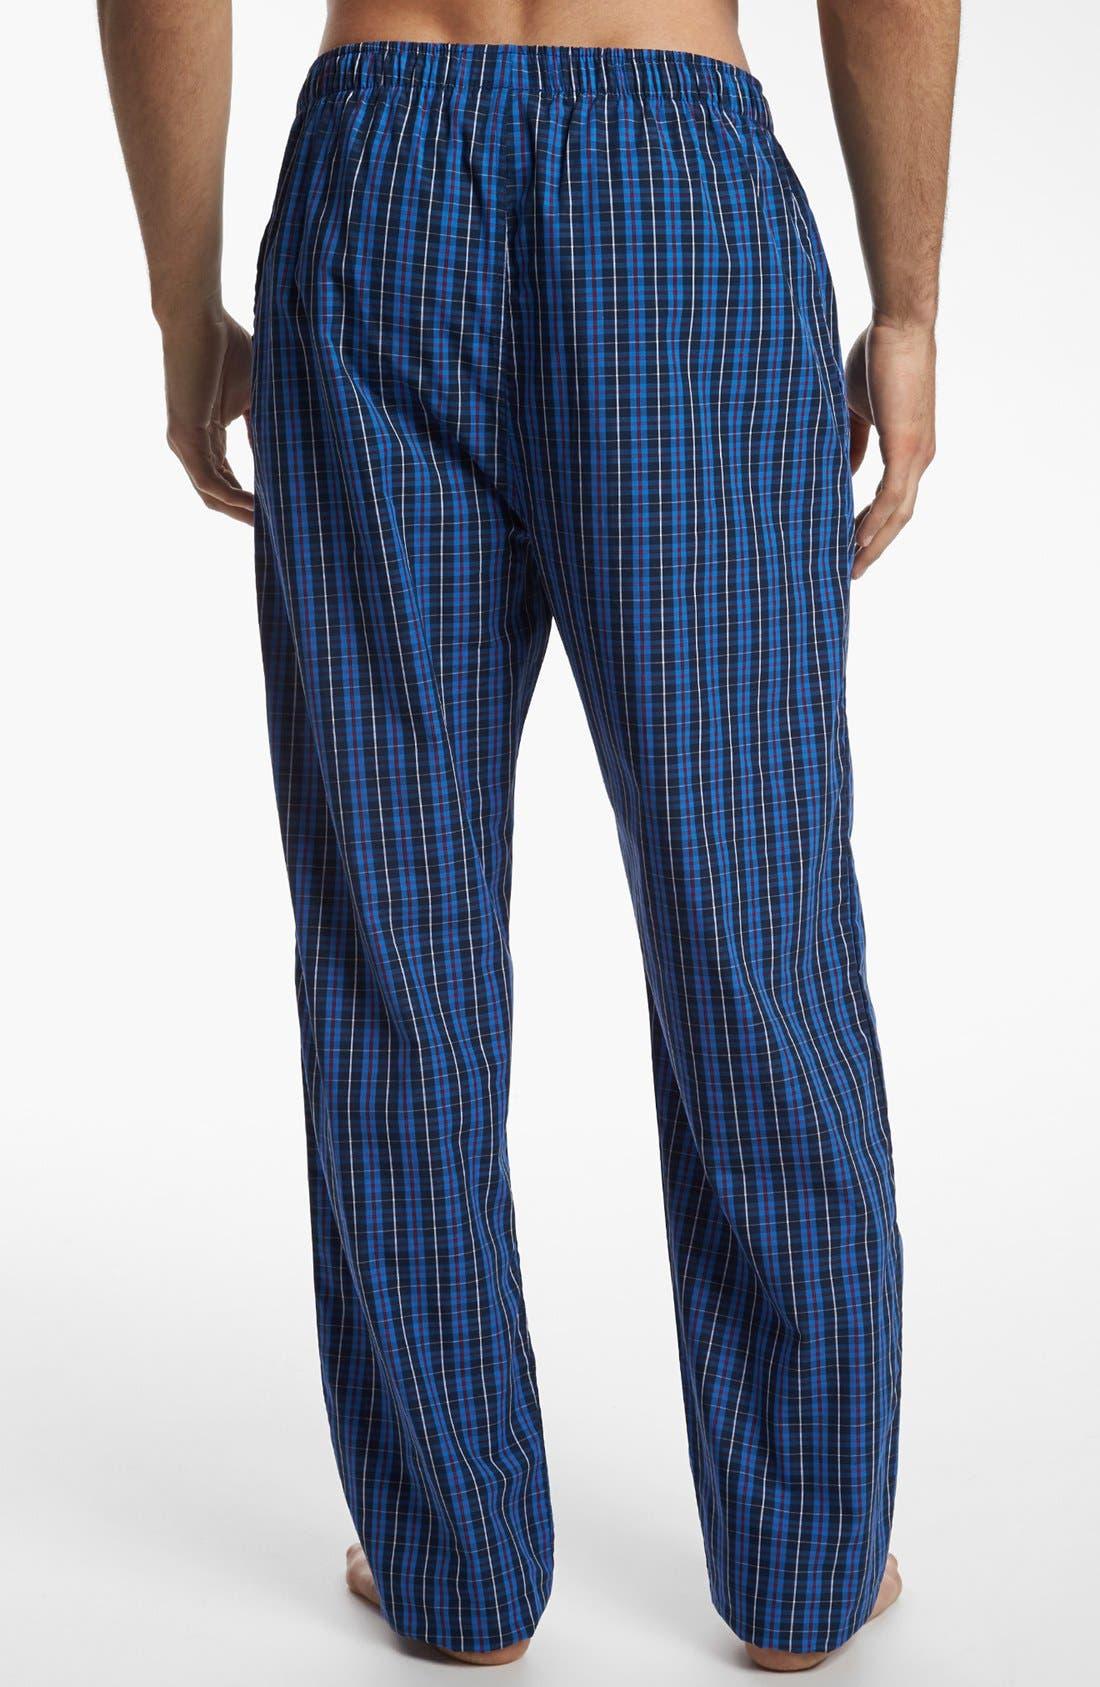 POLO RALPH LAUREN,                             Woven Pajama Pants,                             Alternate thumbnail 2, color,                             HARWICH PLAID